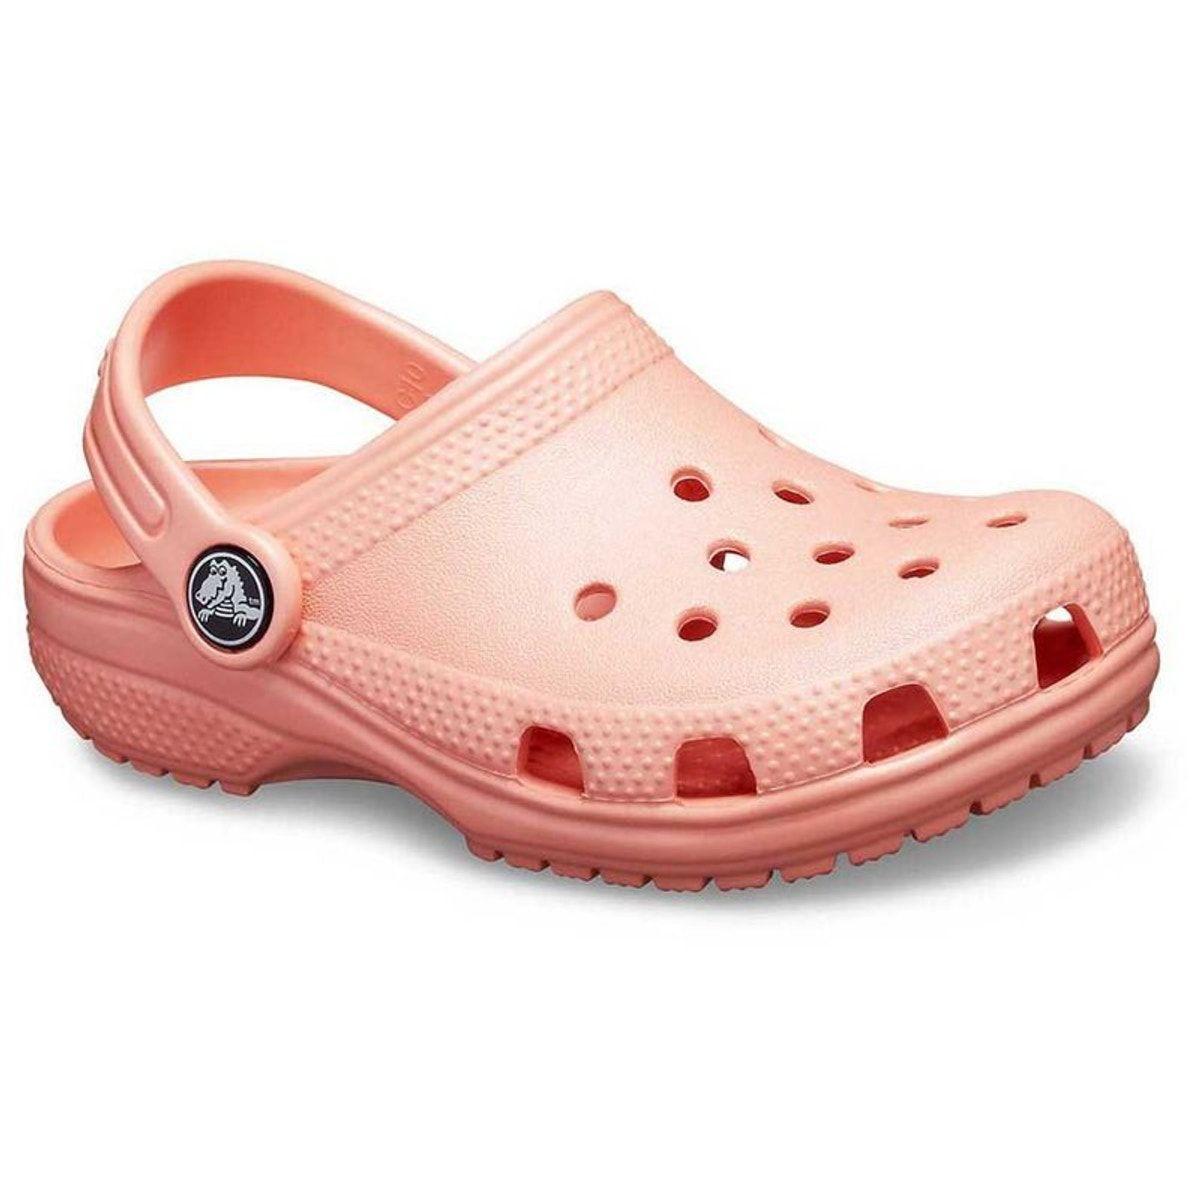 Crocs Unisex-Kinder Crocband Glitter Clogs